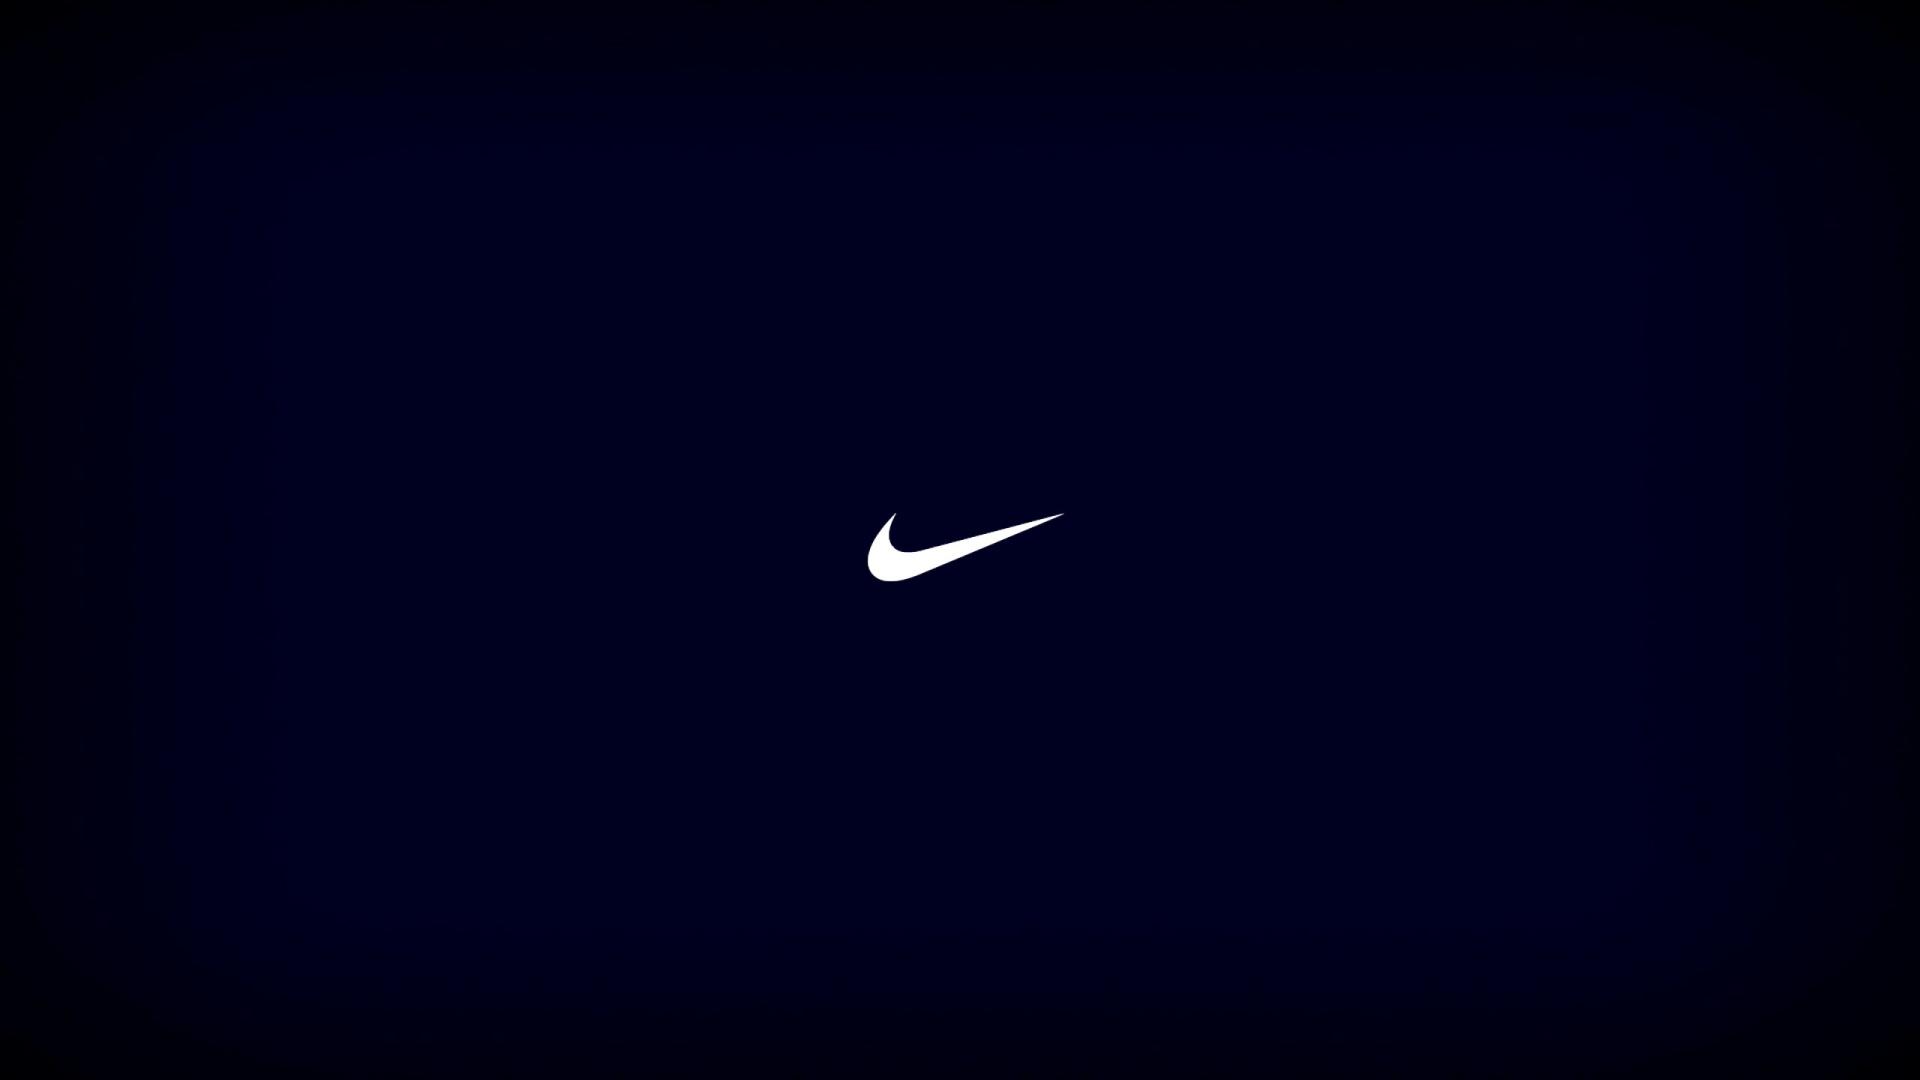 Nike Logo On The Blue Background Wallpaper Desktop Wallpaper with 1920x1080